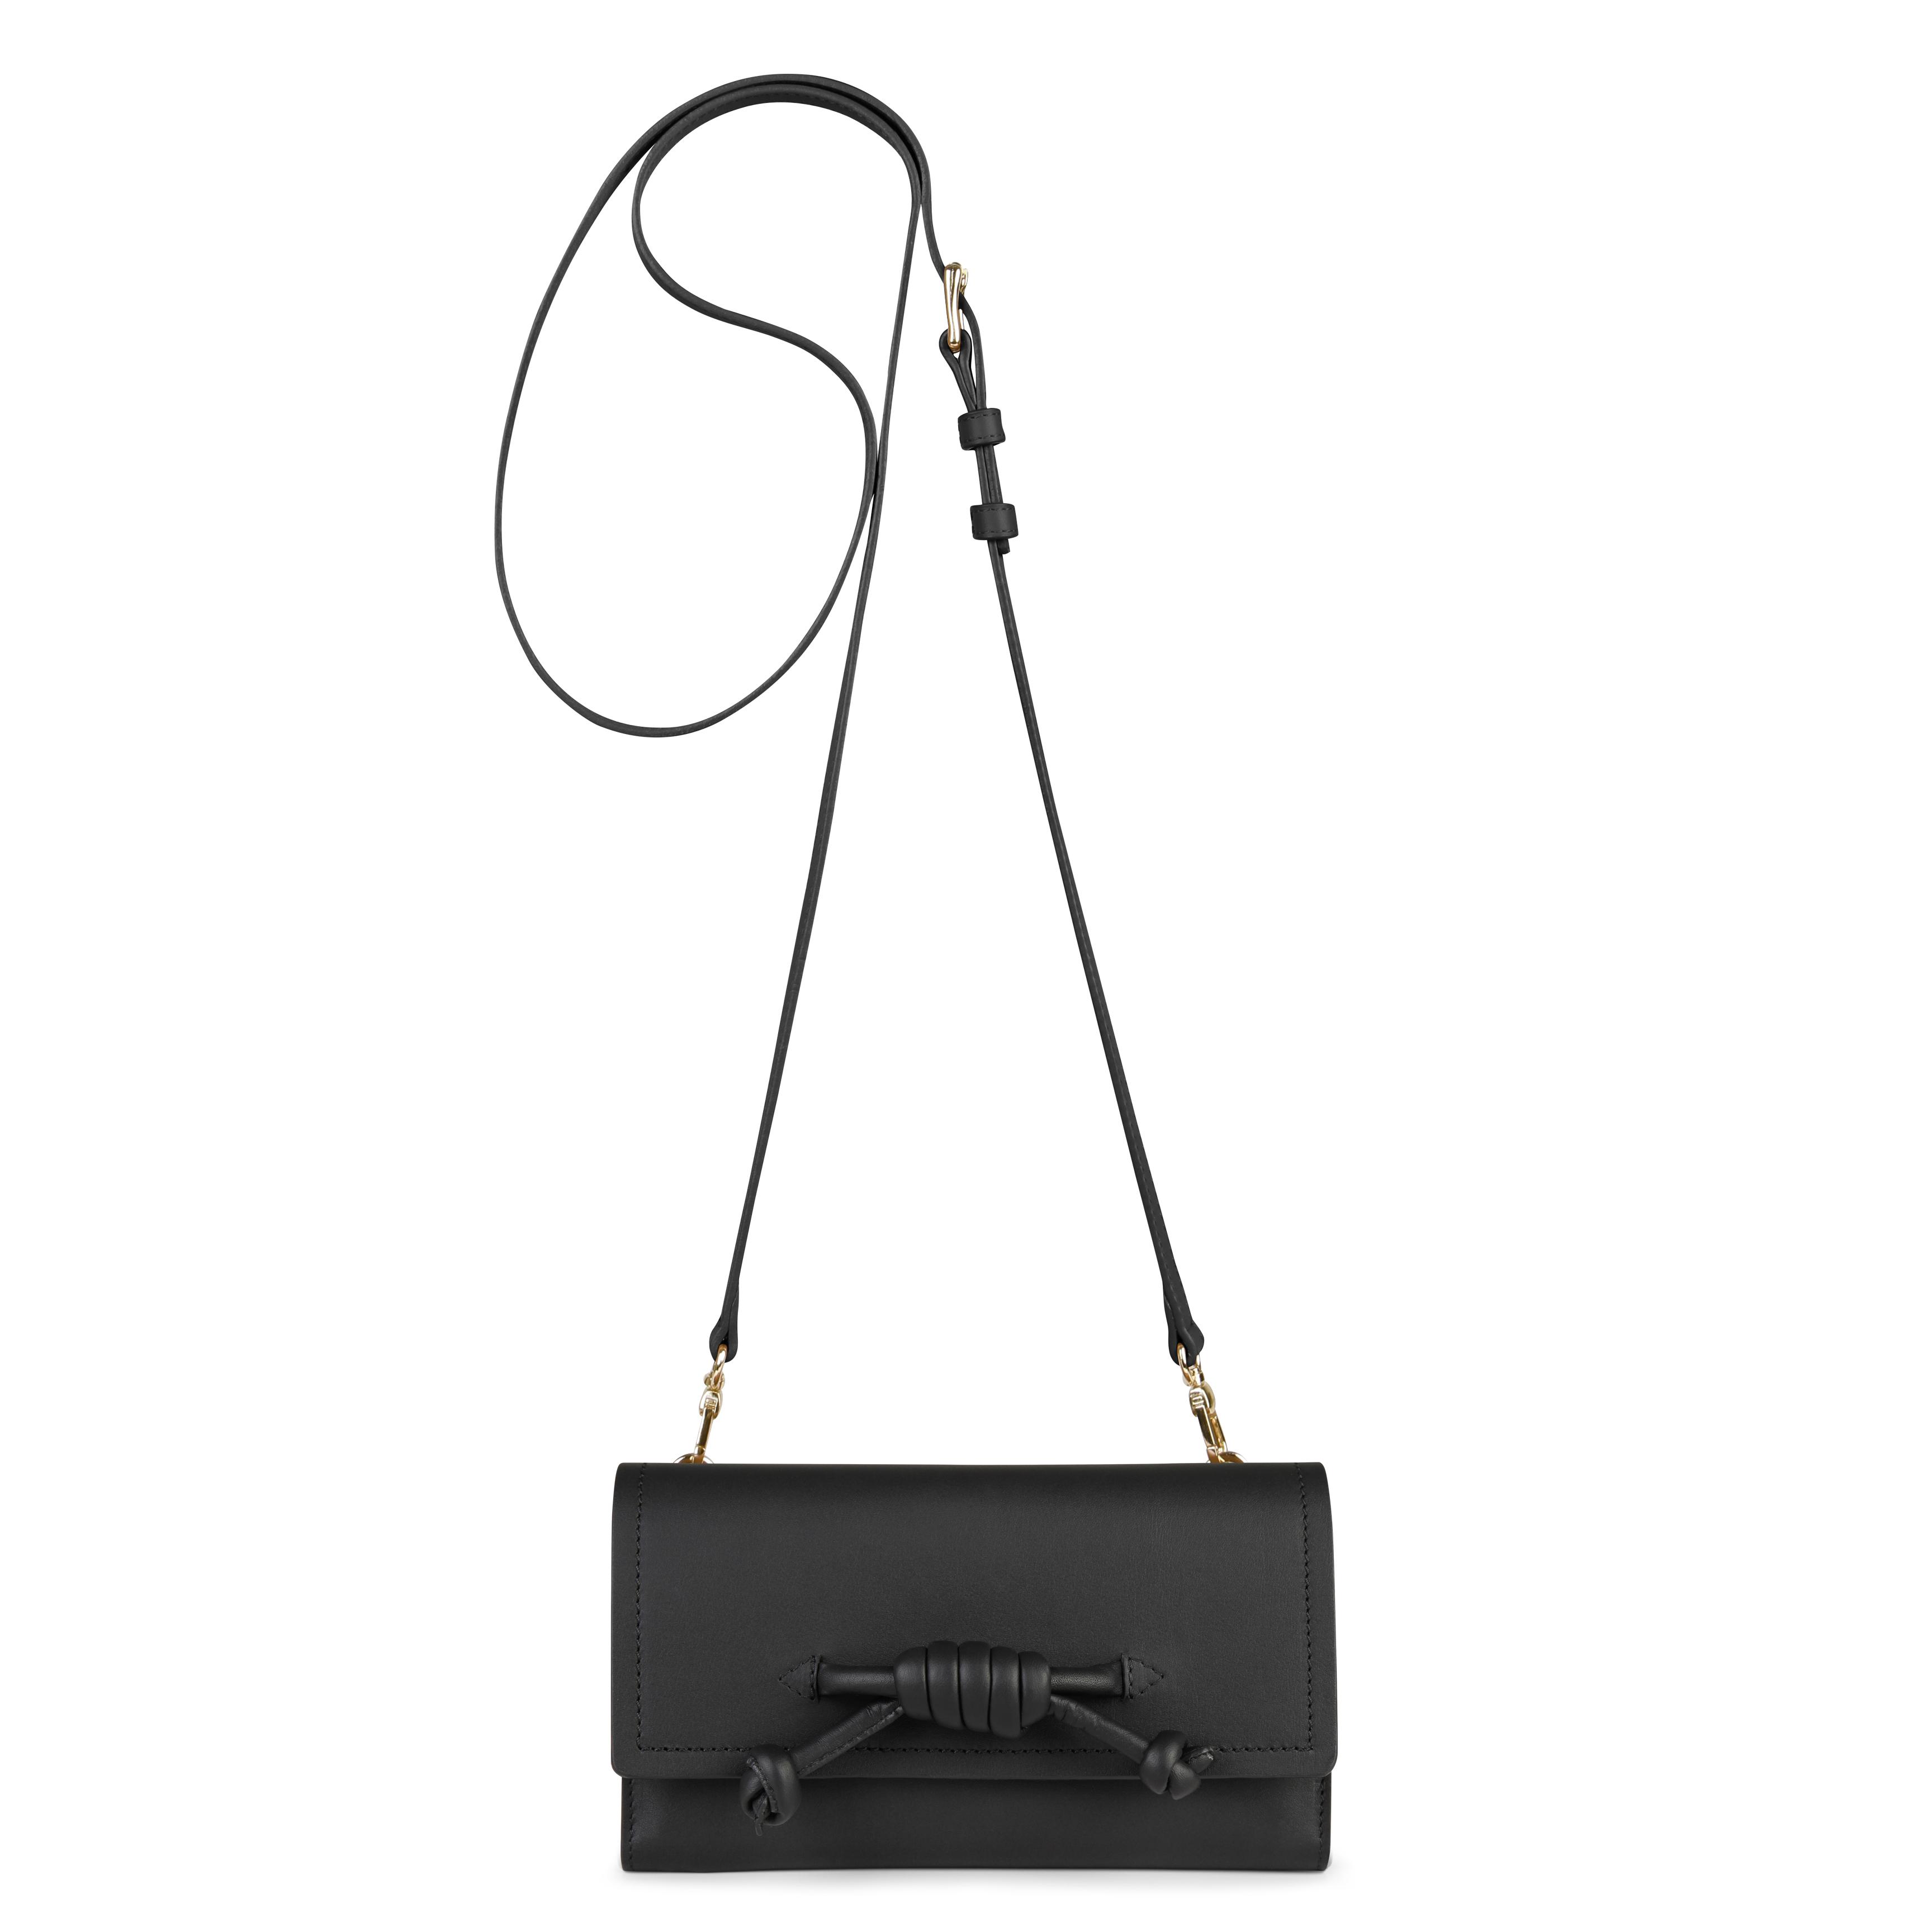 Soho Cross-body Bag - Black by Esin Akan on curated-crowd.com